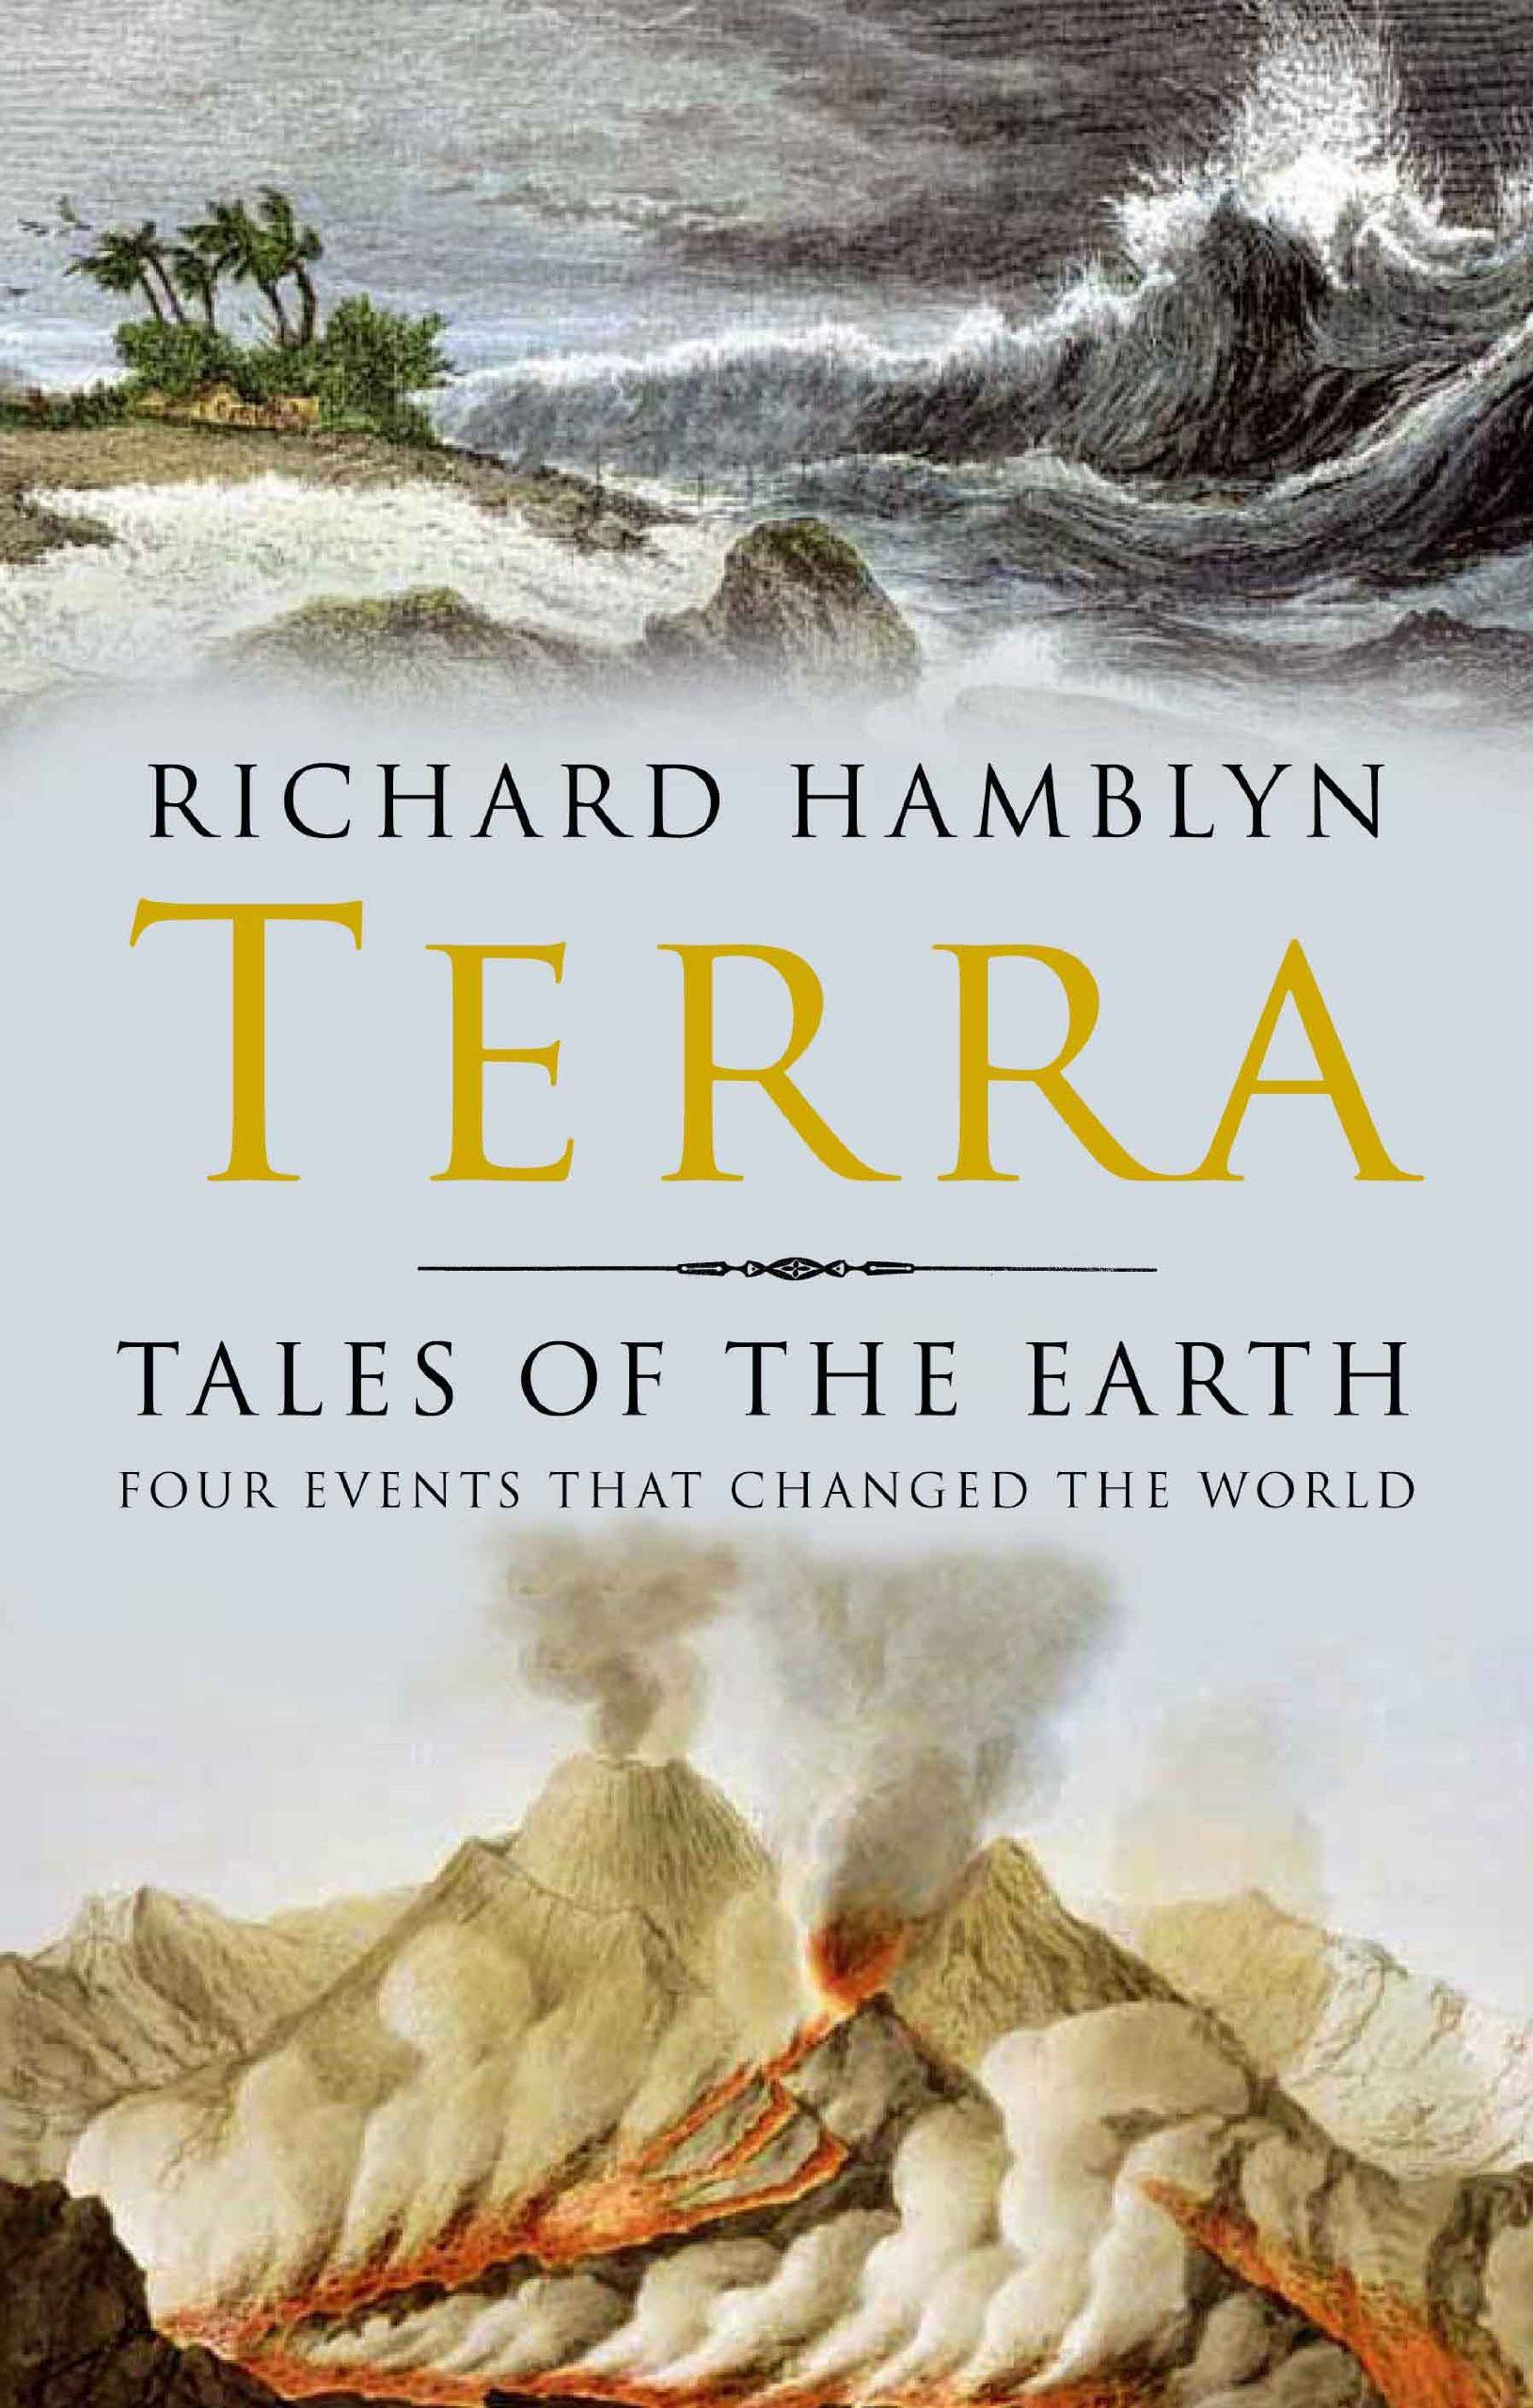 Terra: Tales of the Earth/ Richard Hamblyn- Main Library 550 HAM